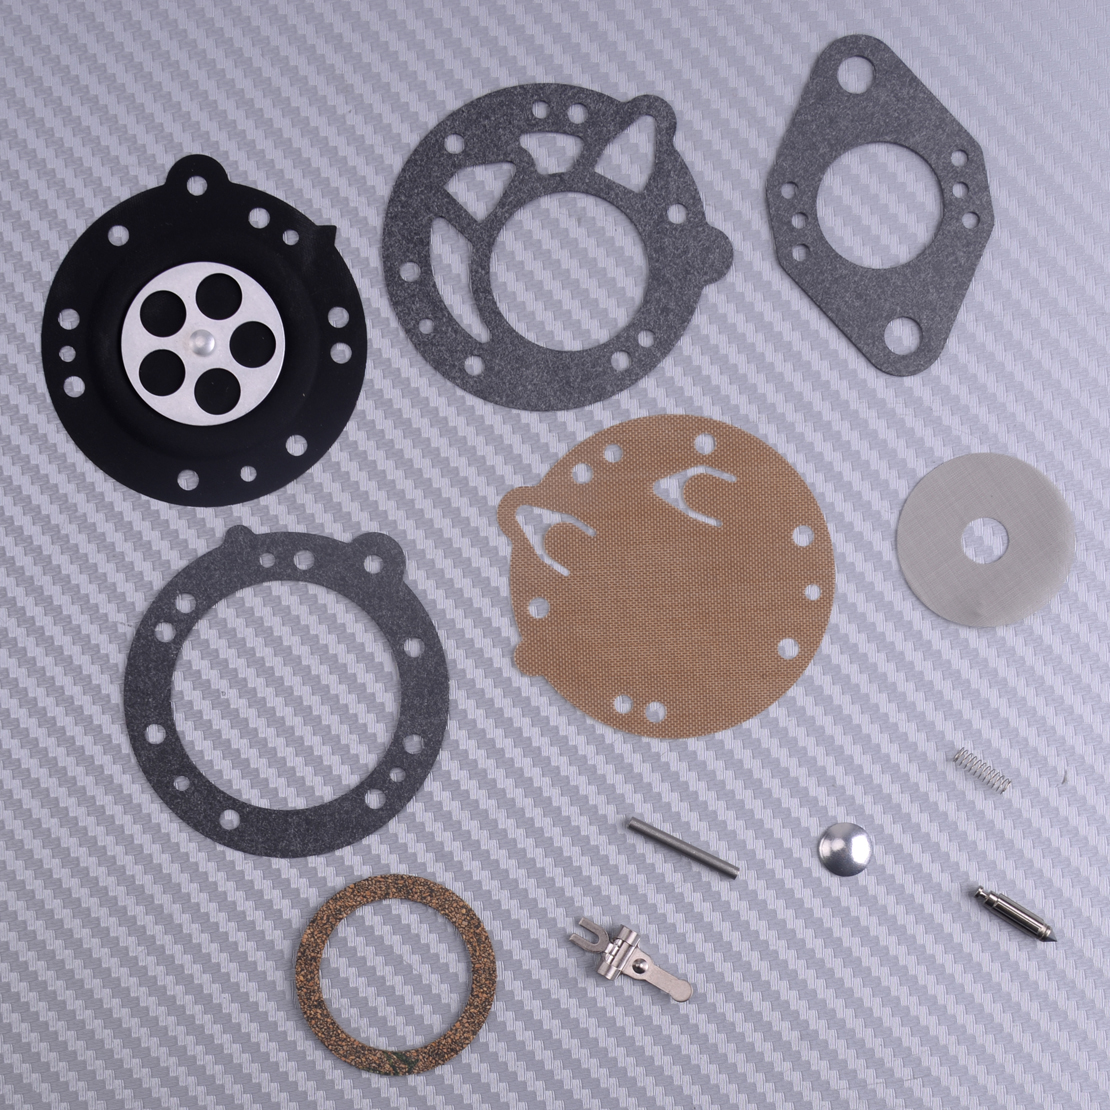 090 TS350 Stihl 070 GND30 TS360 Carburetor Rebuild Kit Zama RB-42 RK-113HL